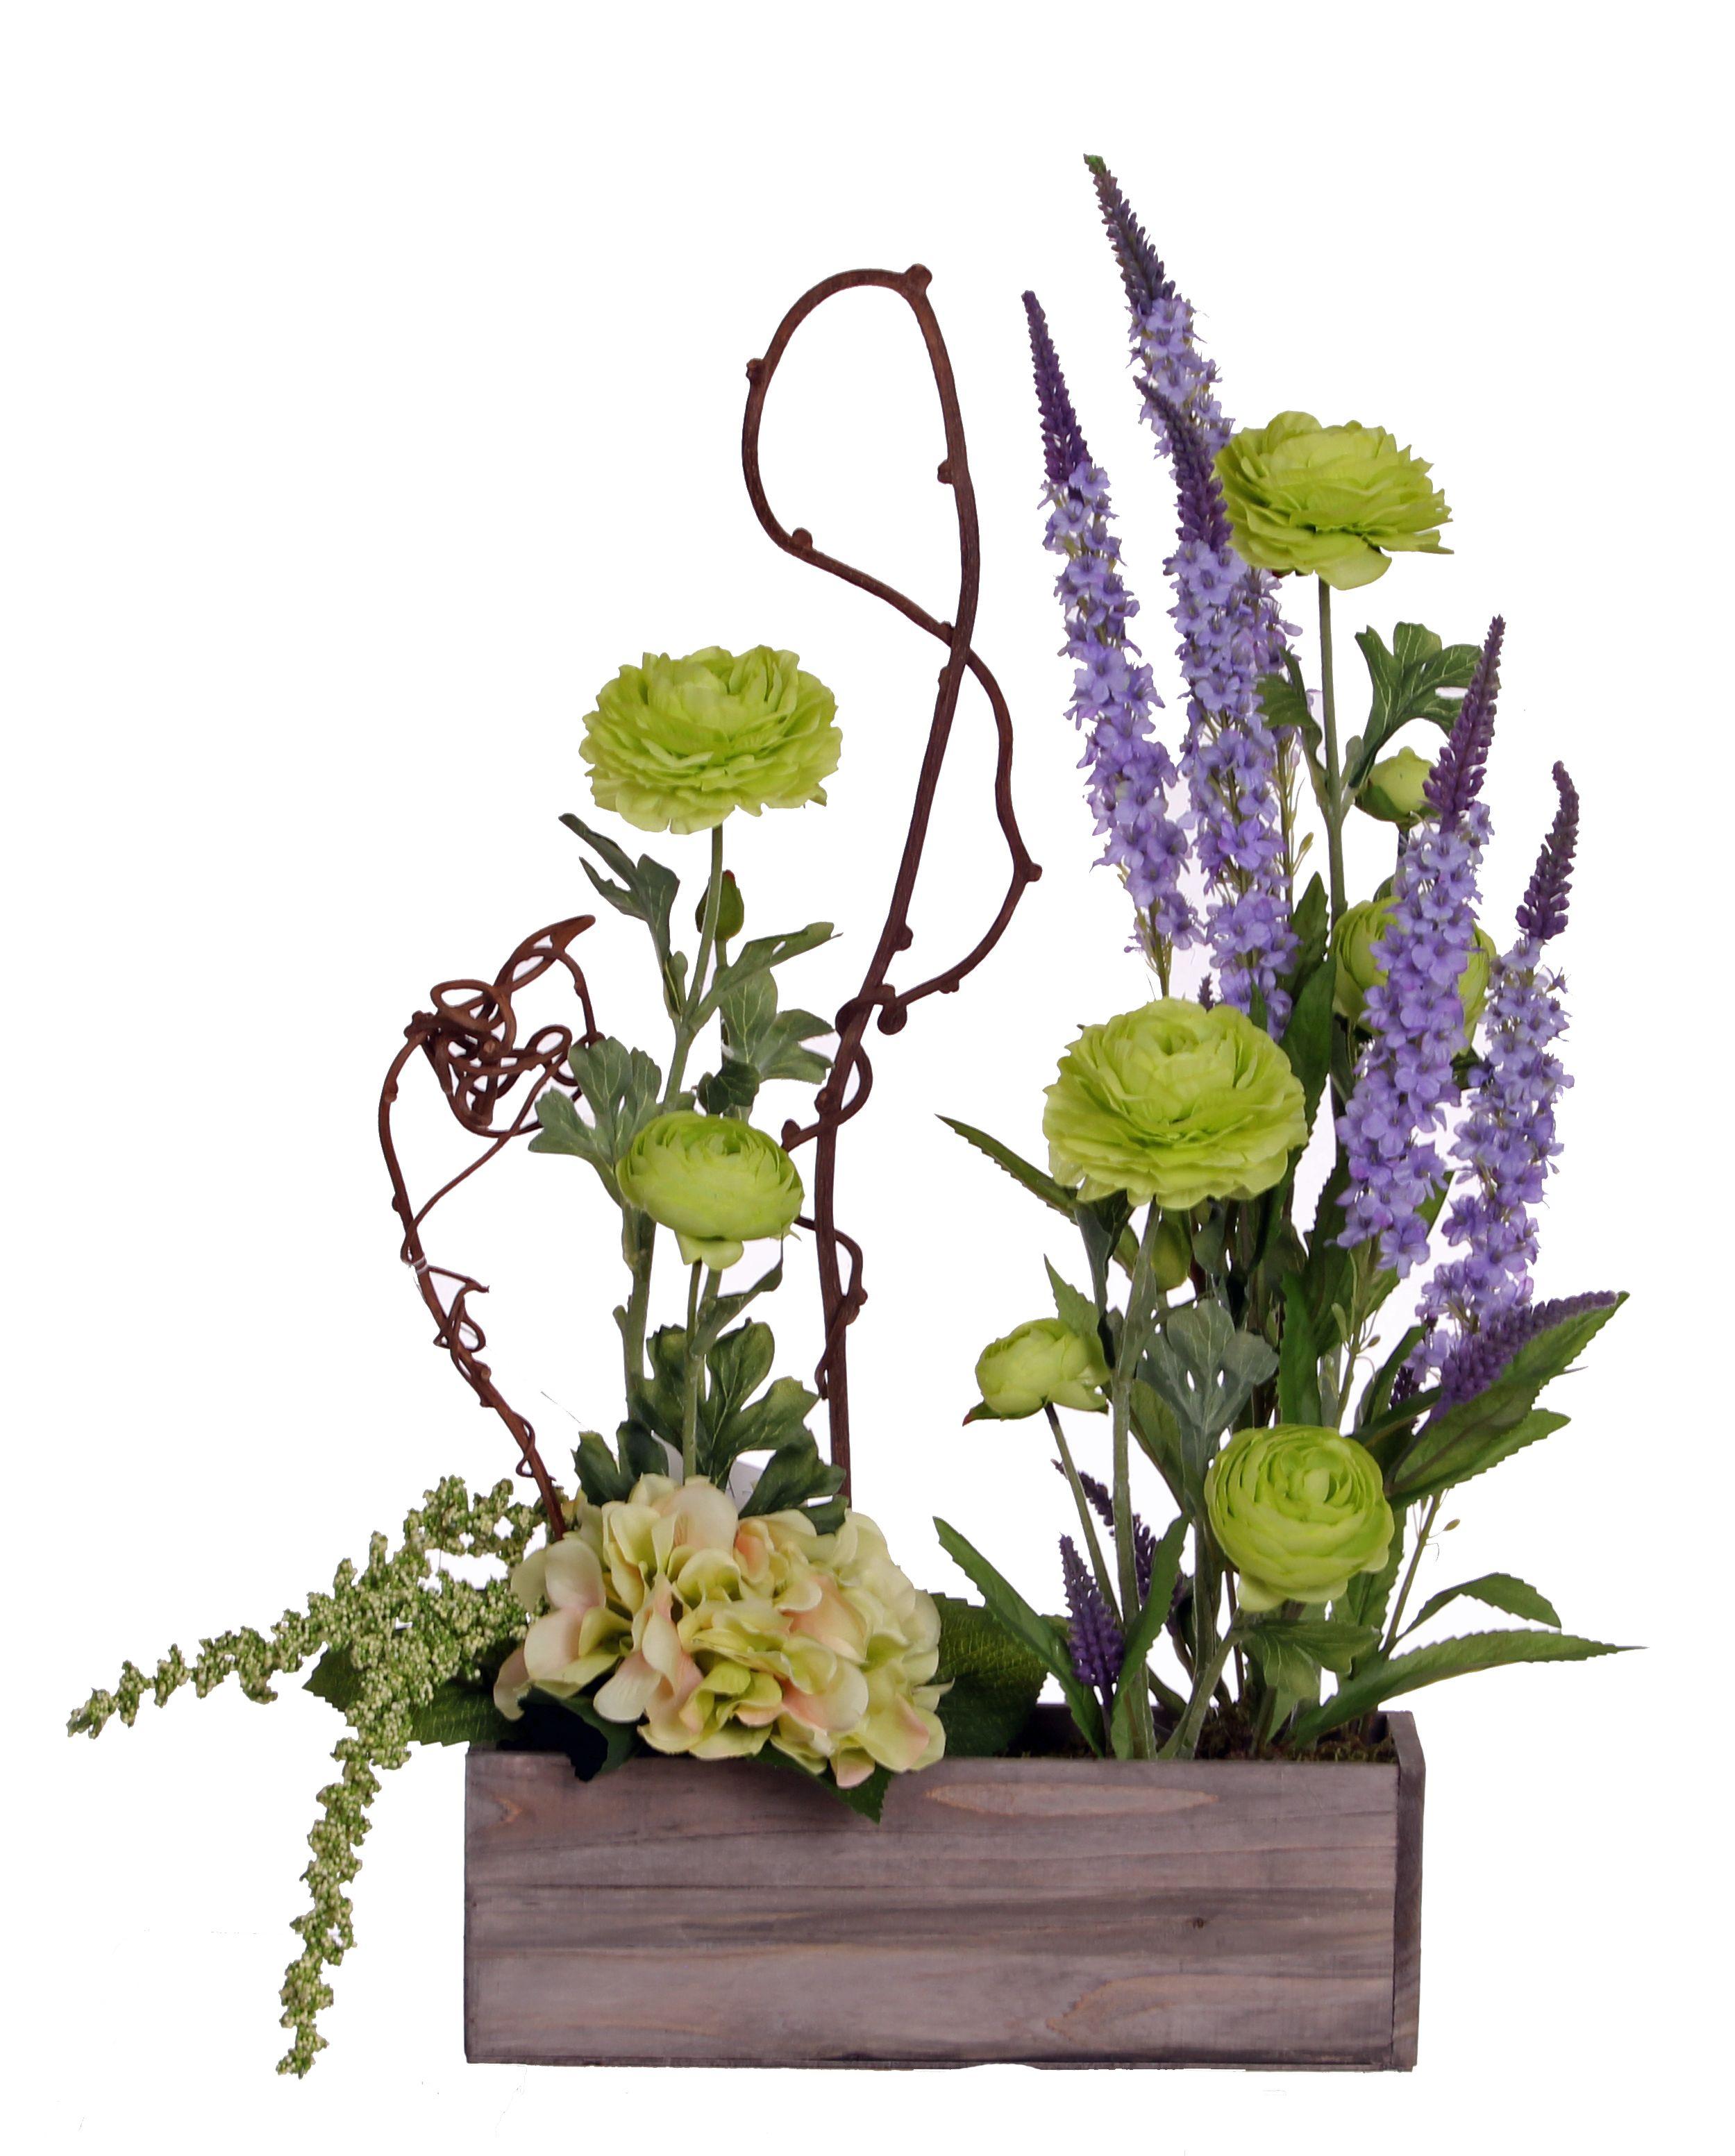 Design By Nicola Parker North American Wholesale Florist 2017 Open